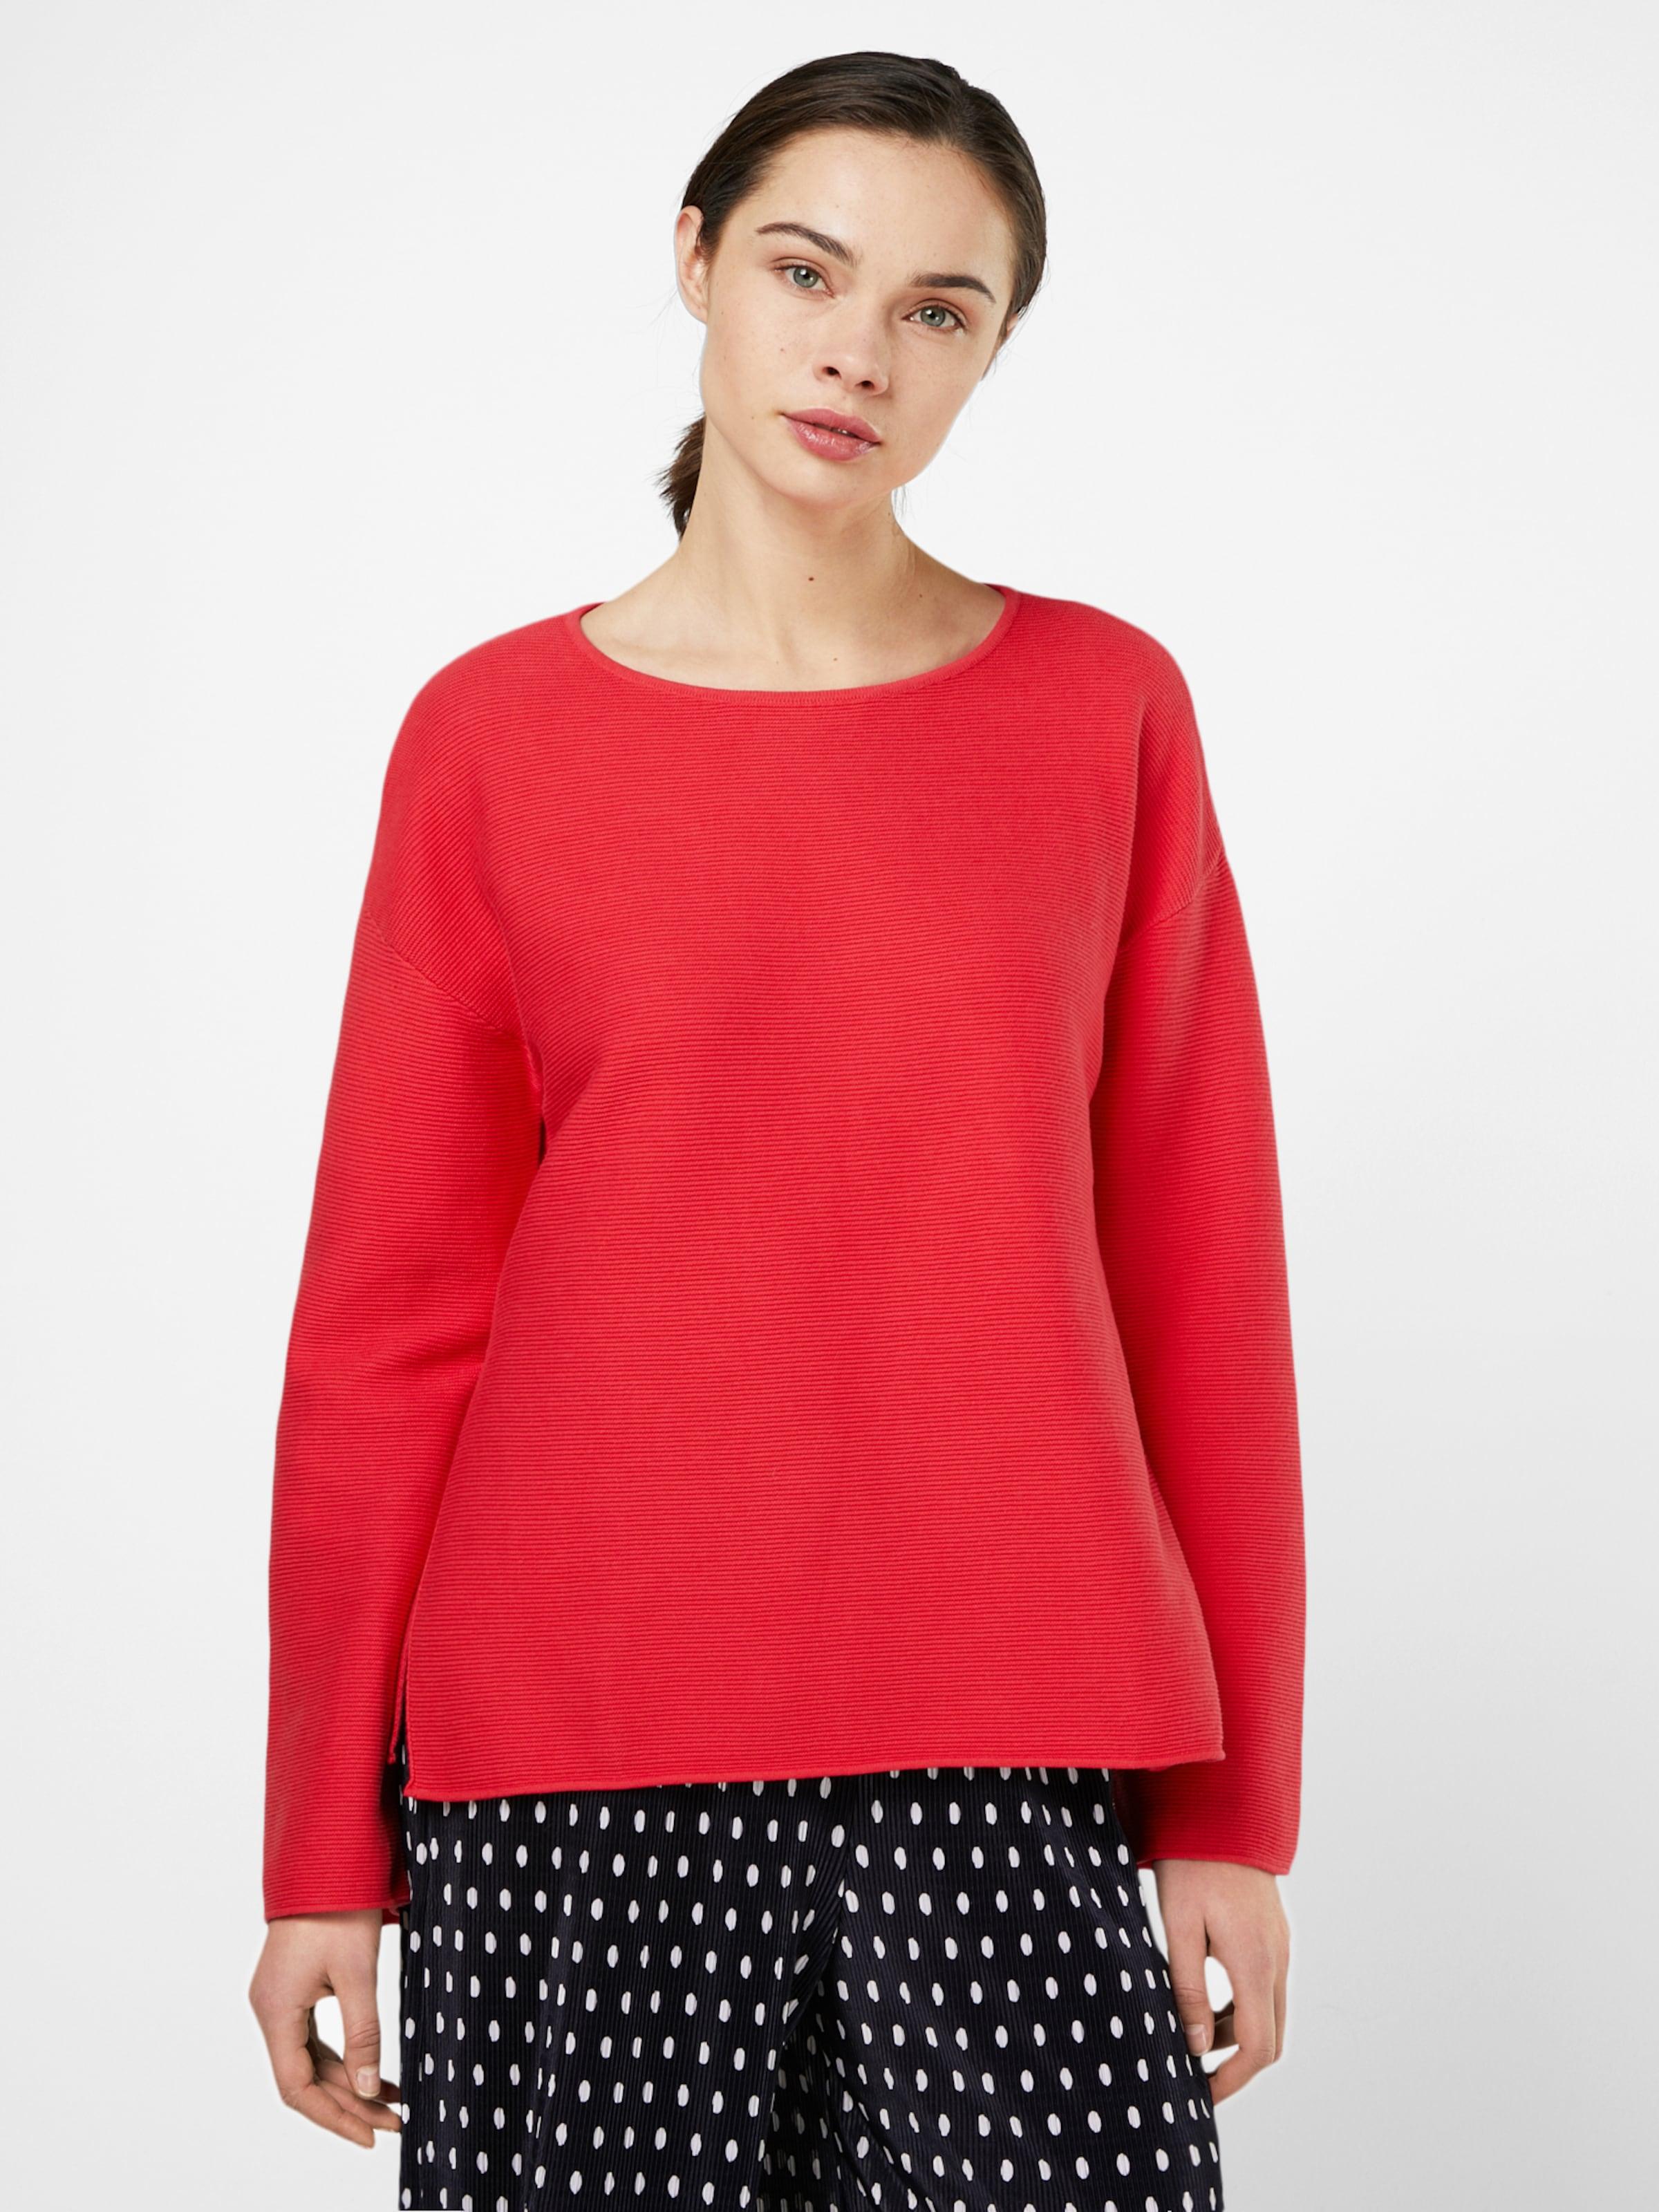 Marc O'Polo Casual Pullover Zu Verkaufen ZMrer5w